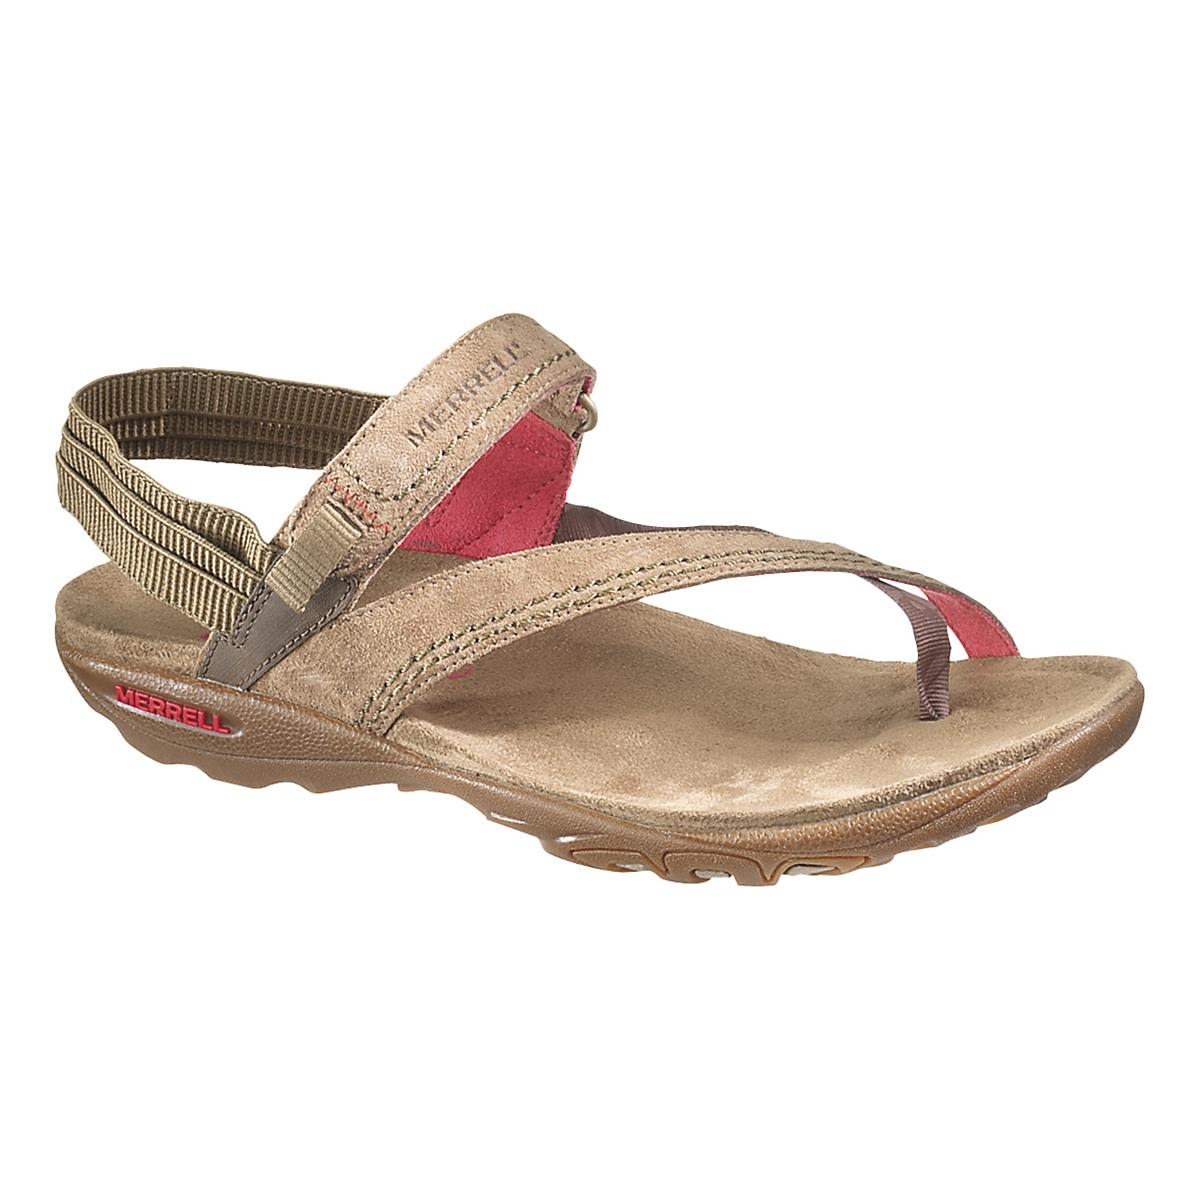 7813fcdfcb39 Womens Merrell Mimosa Clove Sandals Shoe at Road Runner Sports